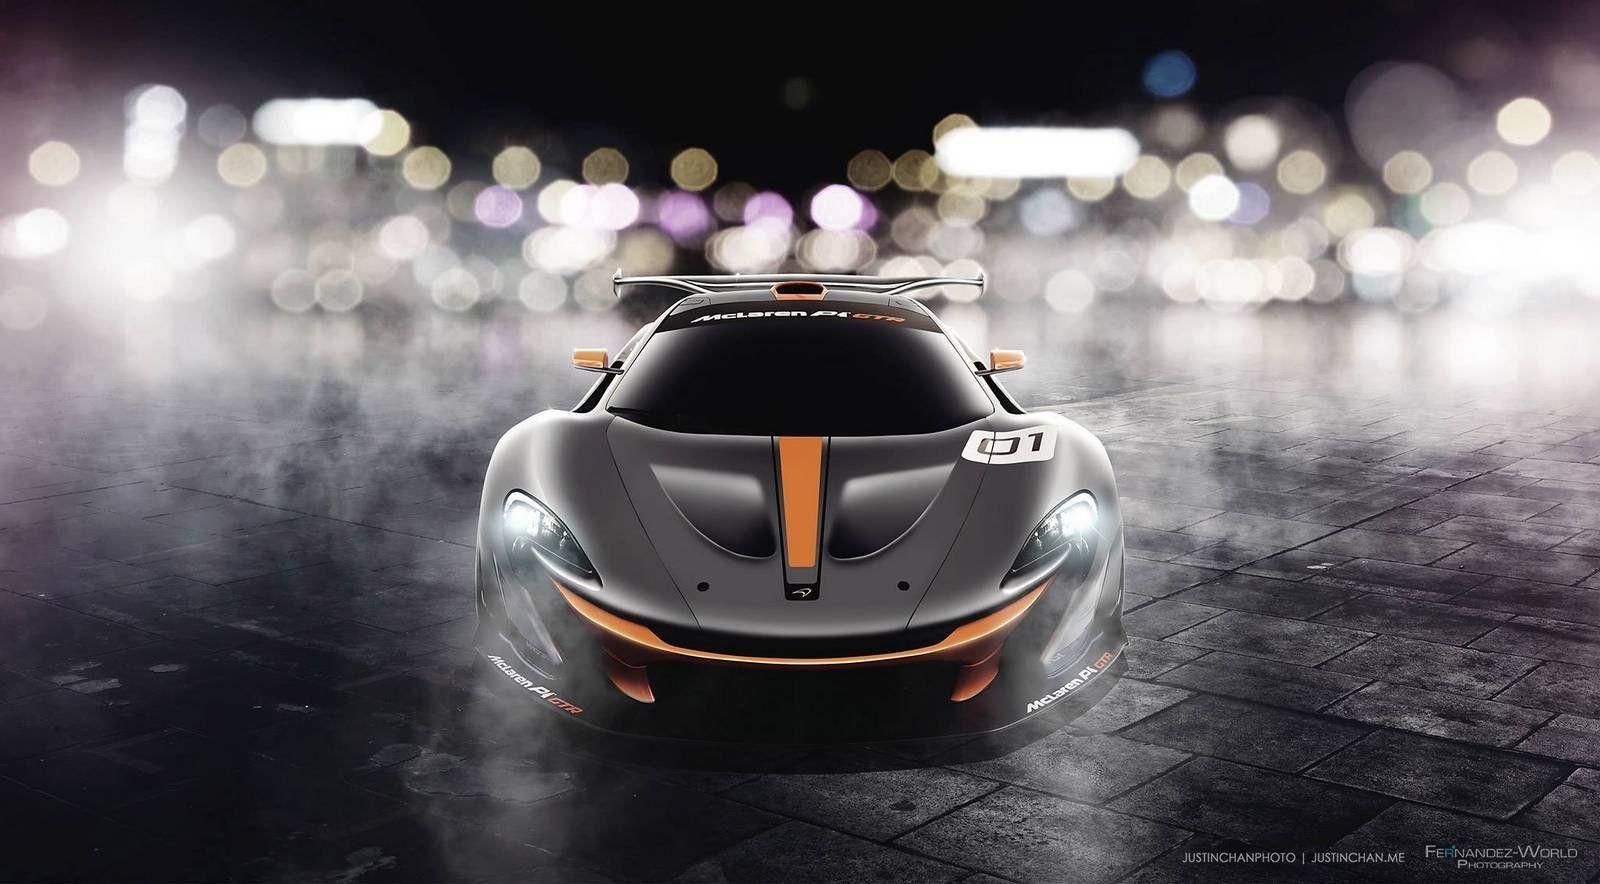 2016 McLaren P1 GTR Wallpaper Wallpaper